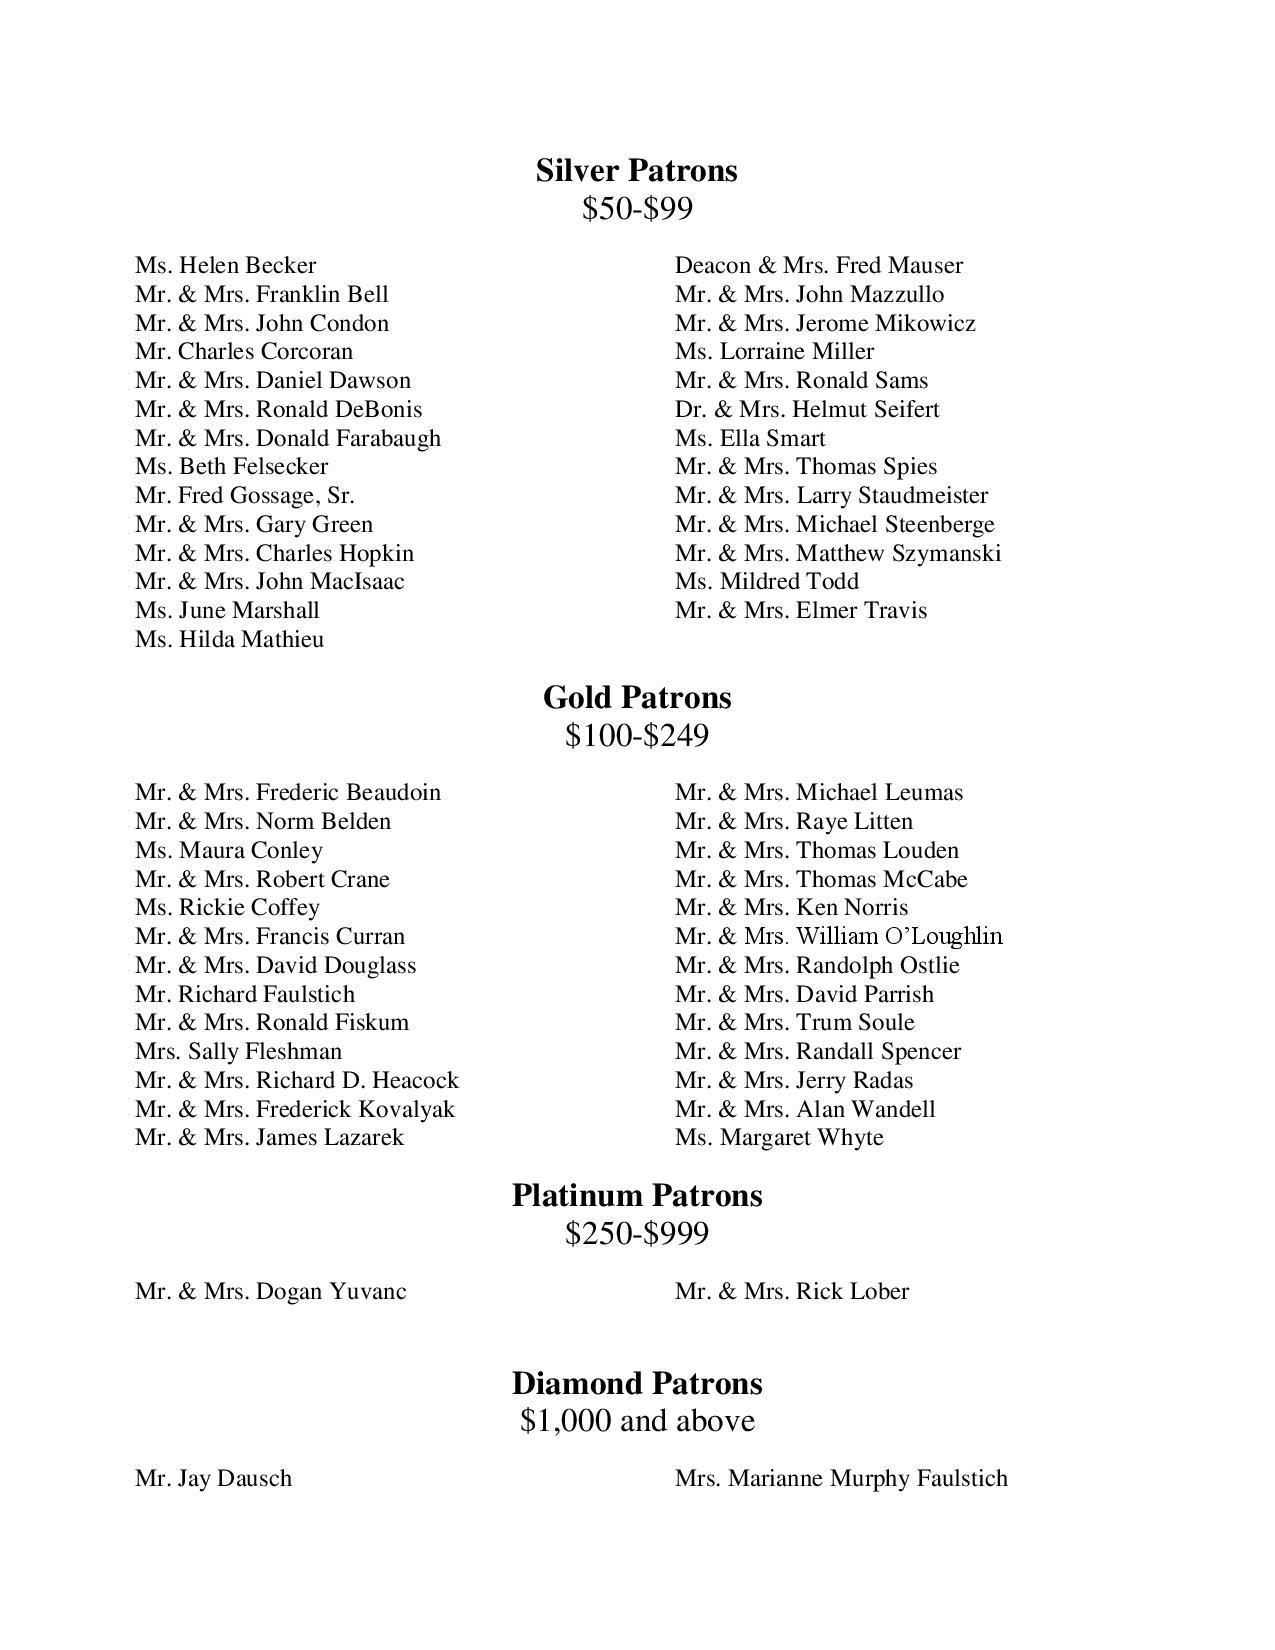 2012-04-29 Program Final-page-012.jpg